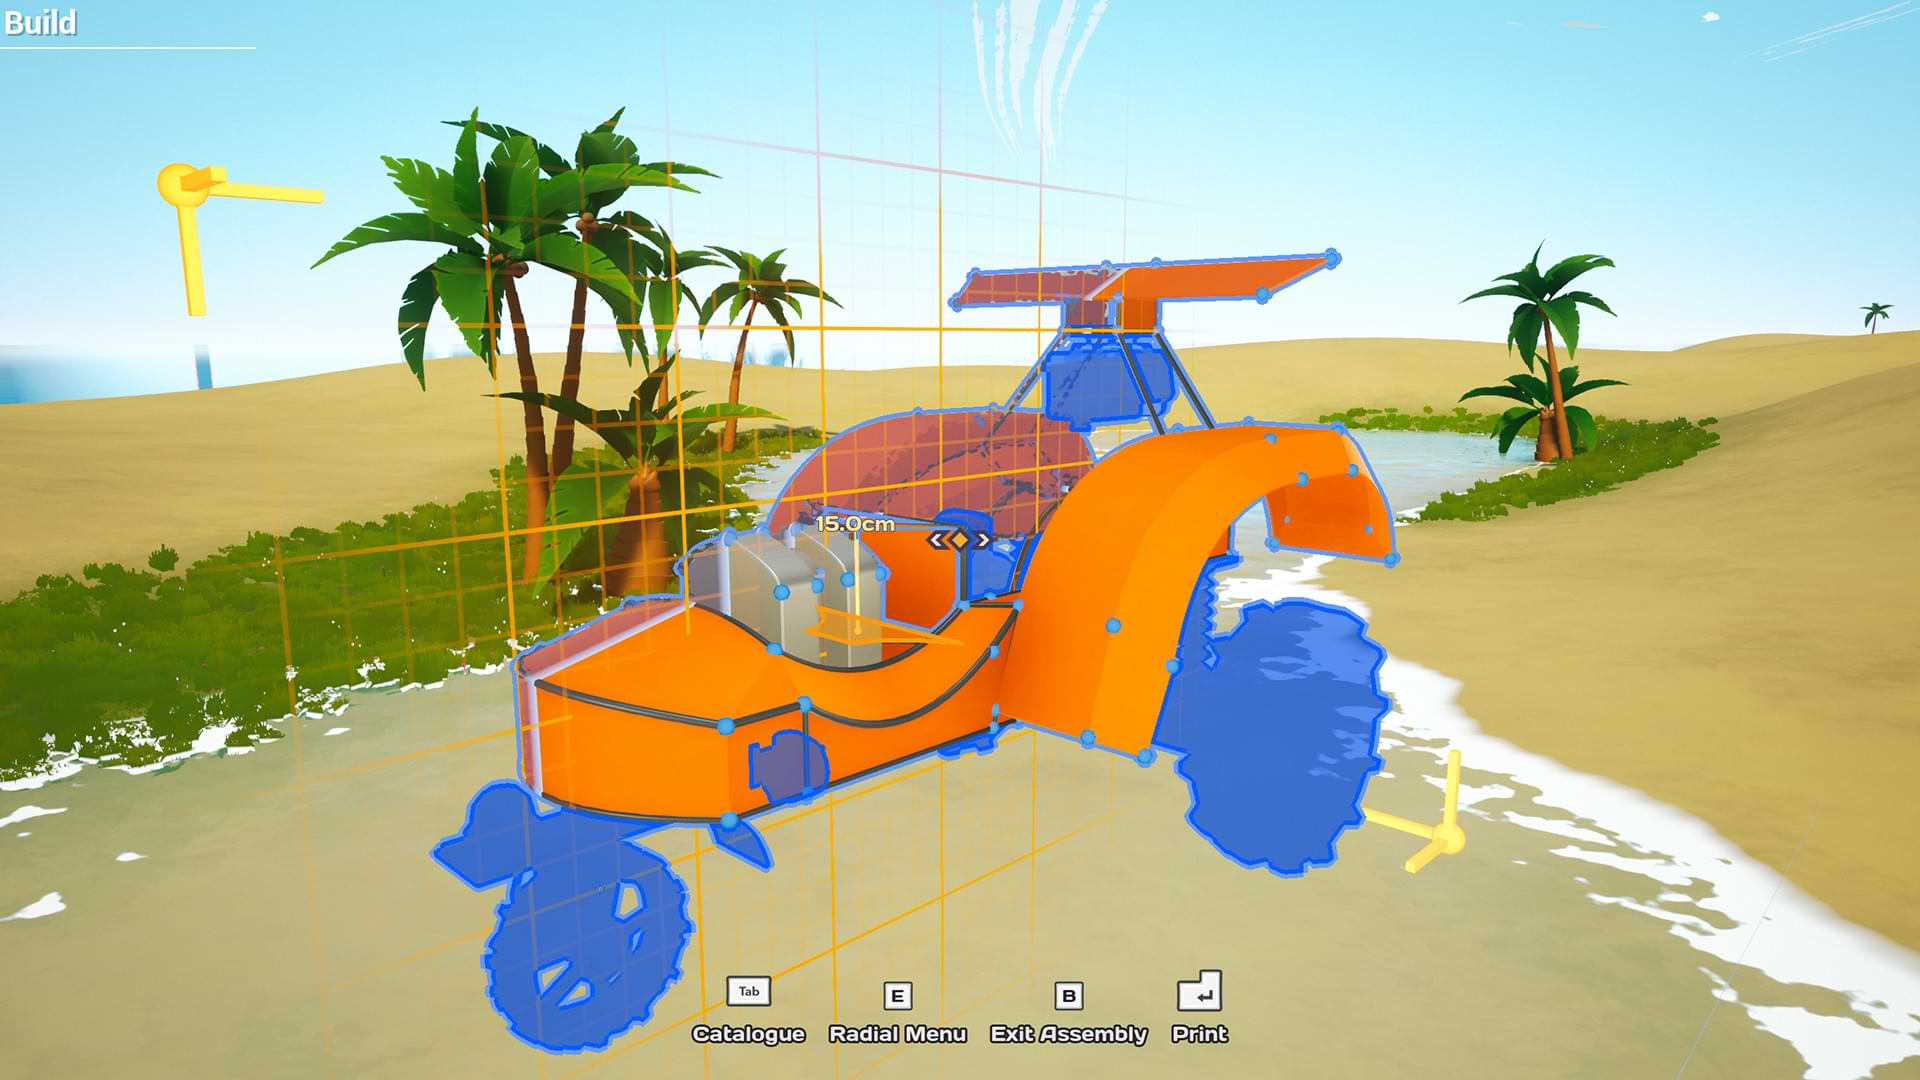 Main Assembly - Robots Assemble!